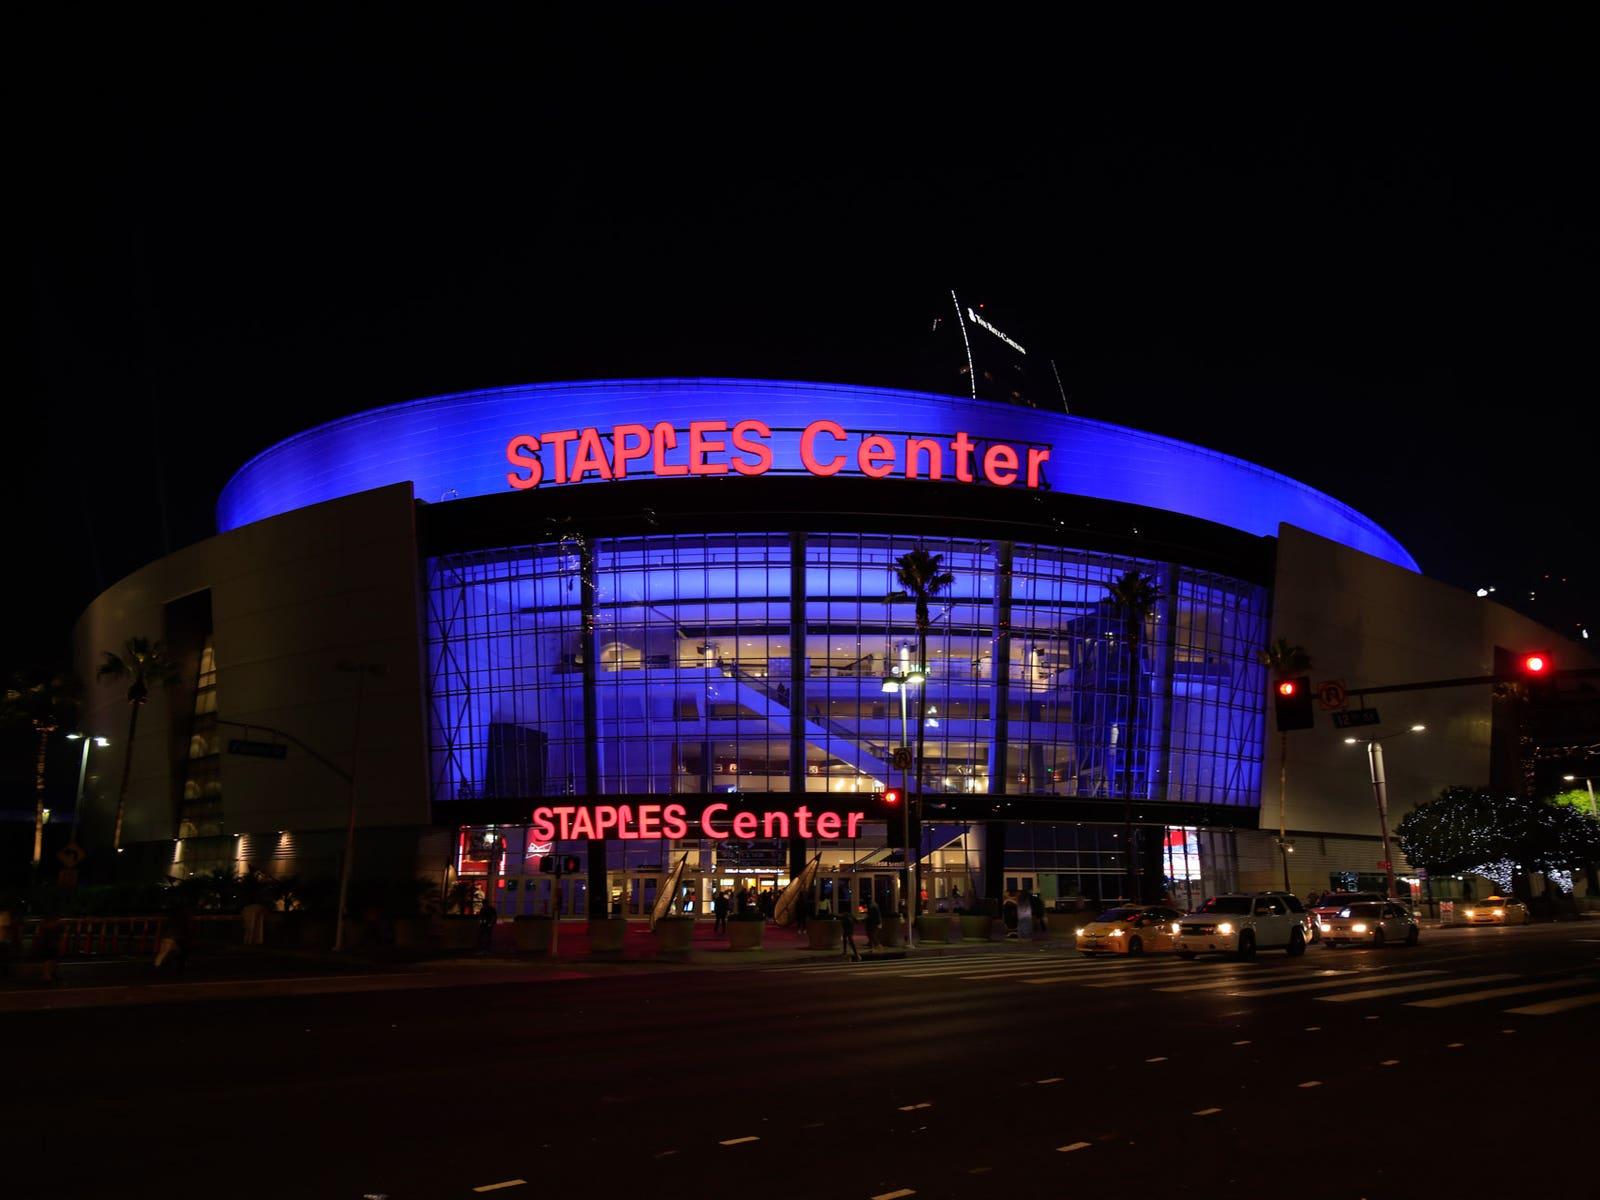 STAPLES Center Night